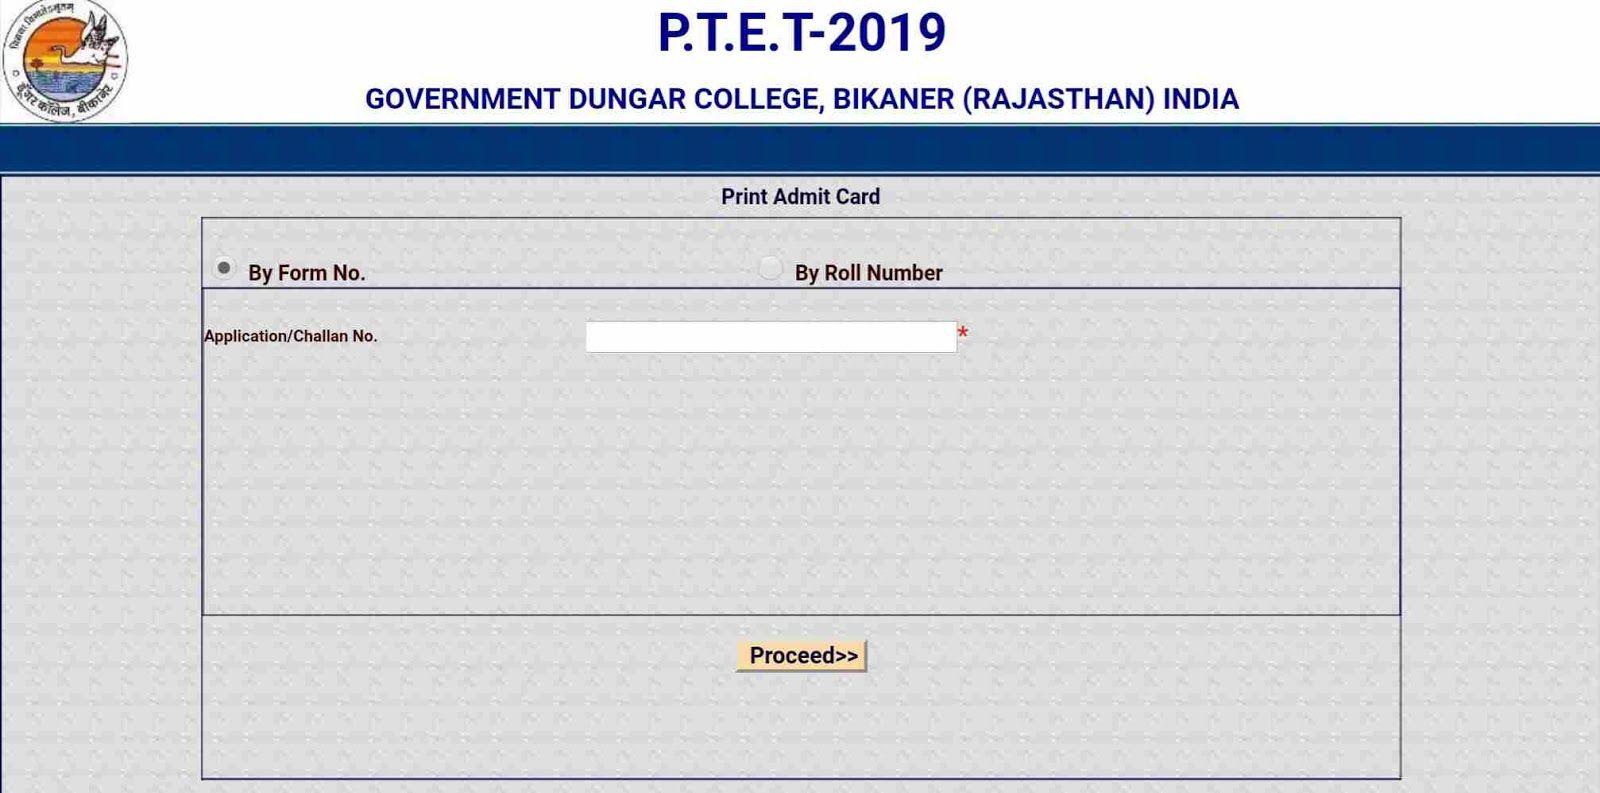 Rajasthan Ptet 2019 Admit Card Download Rajasthan Cards Card Downloads